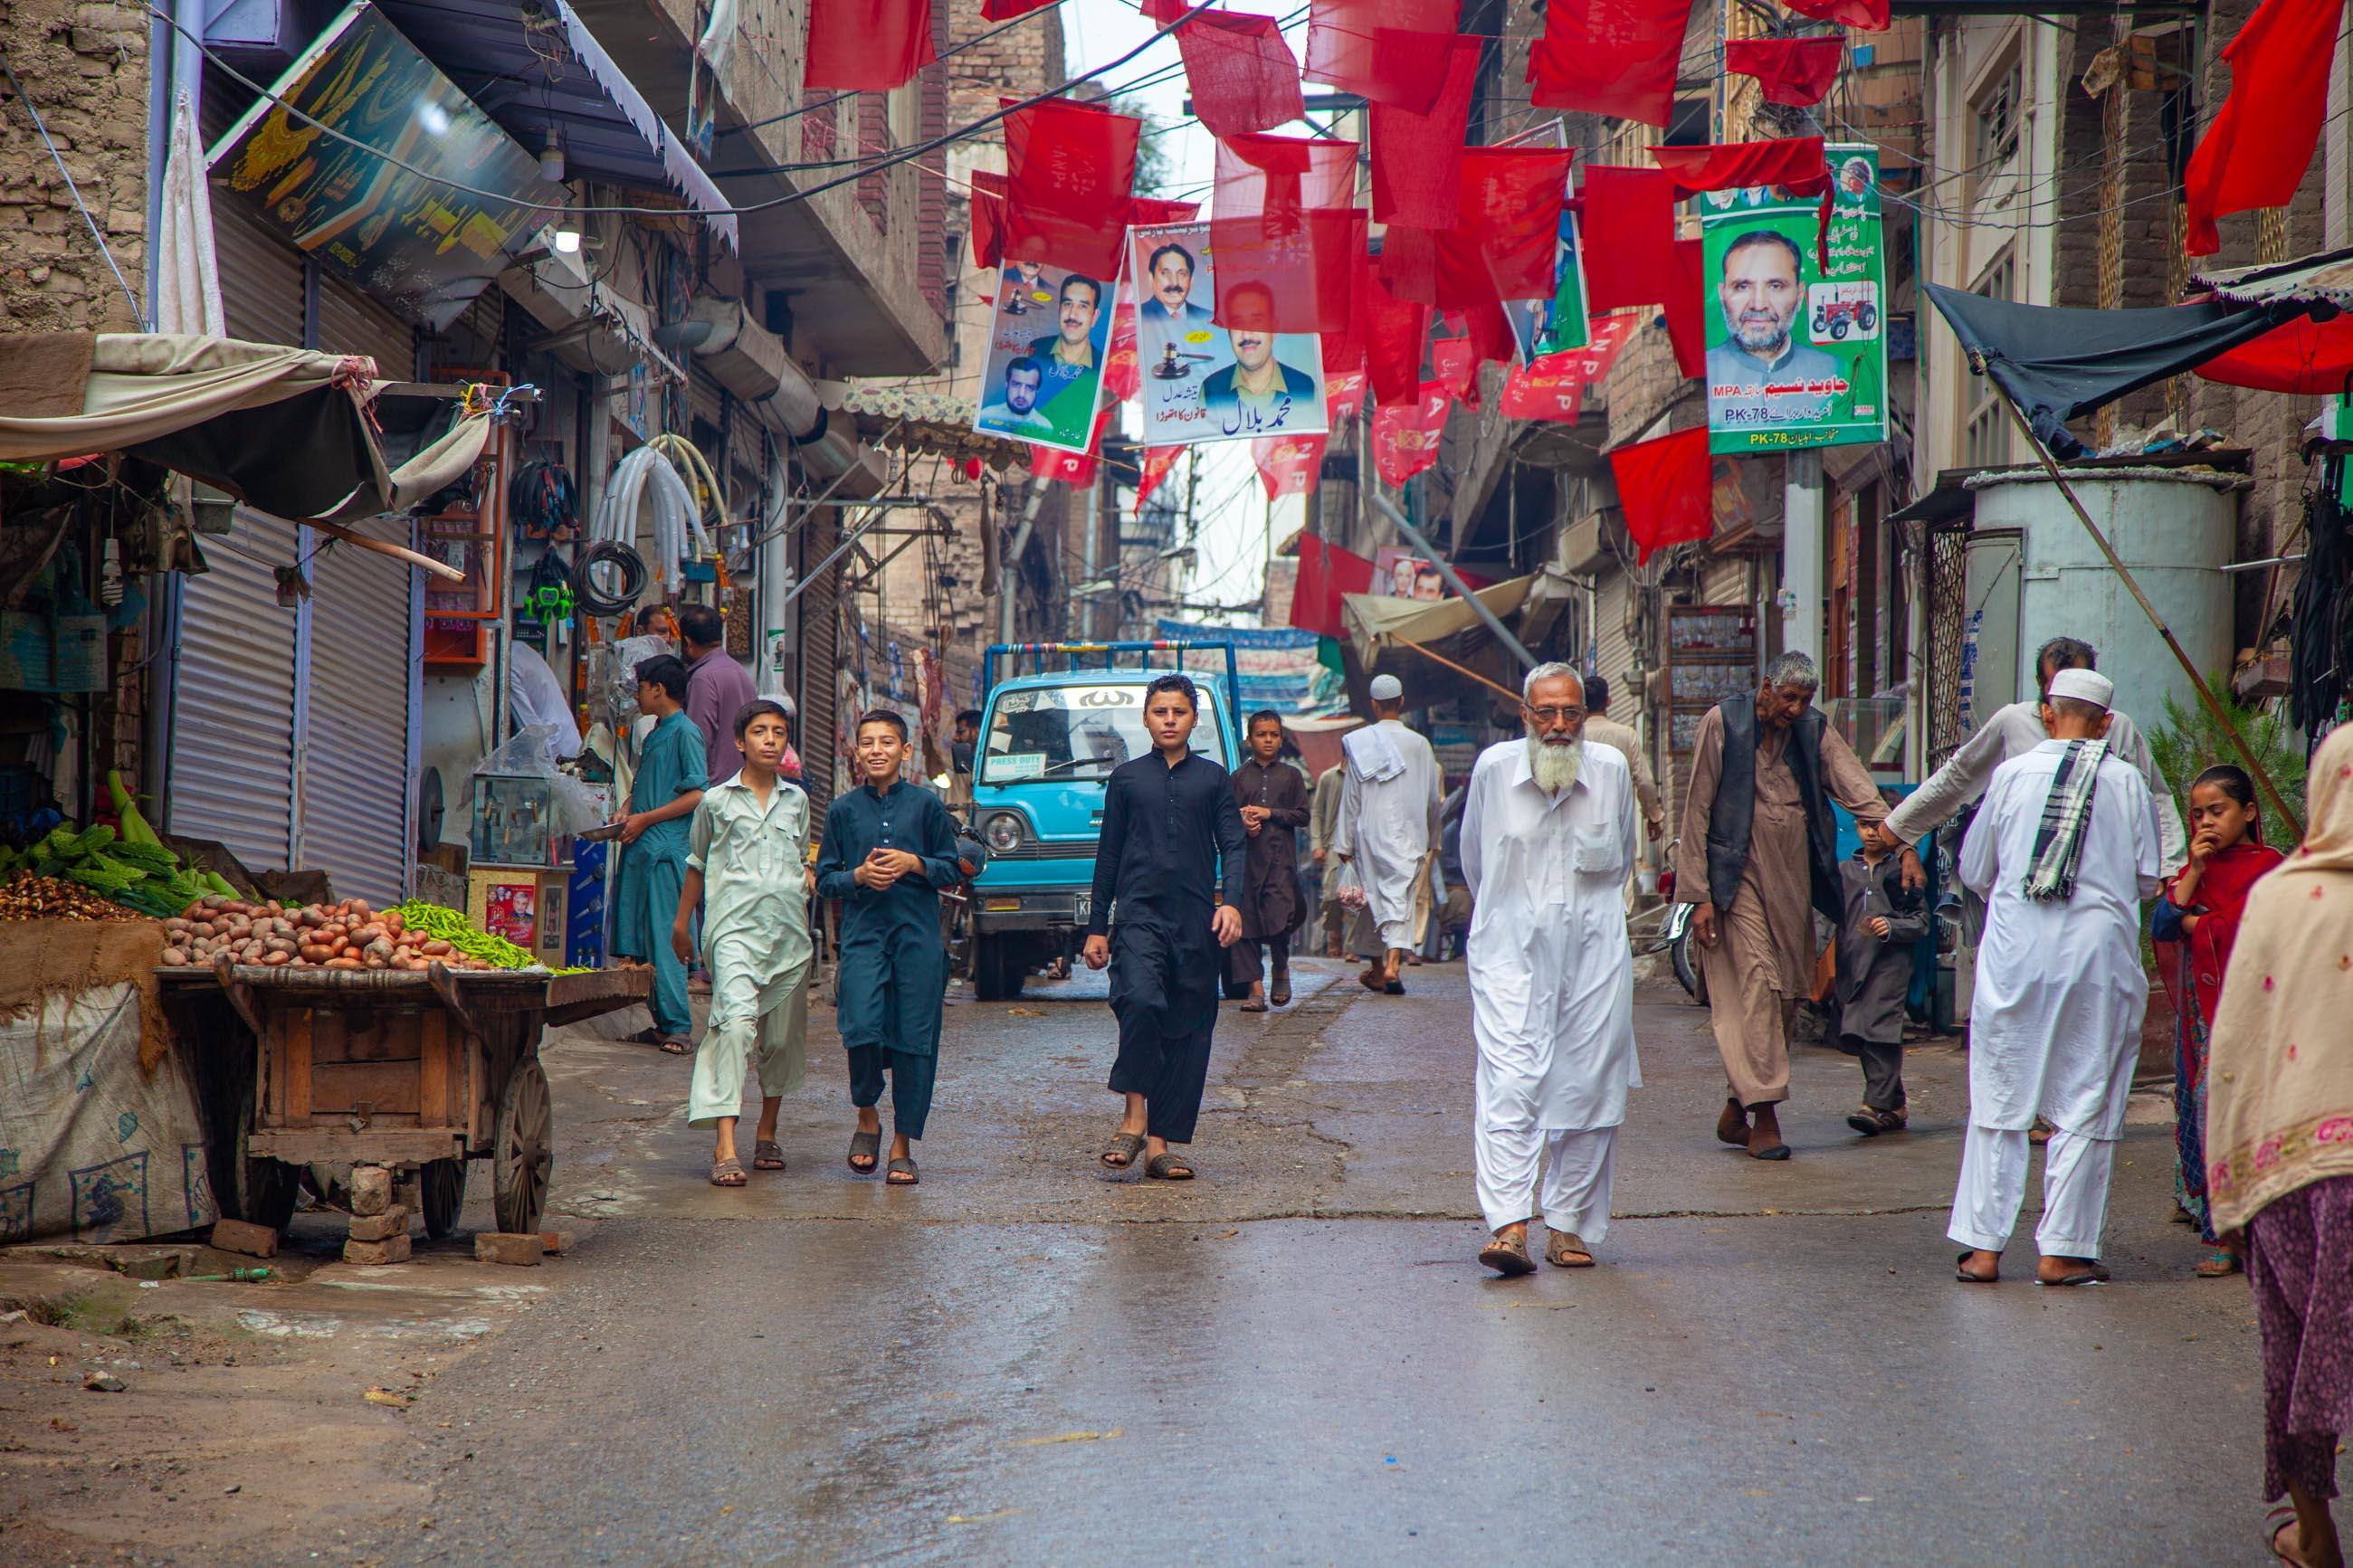 https://bubo.sk/uploads/galleries/4920/samuelklc_pakistan_peshawar_lahore_img_0006.jpg